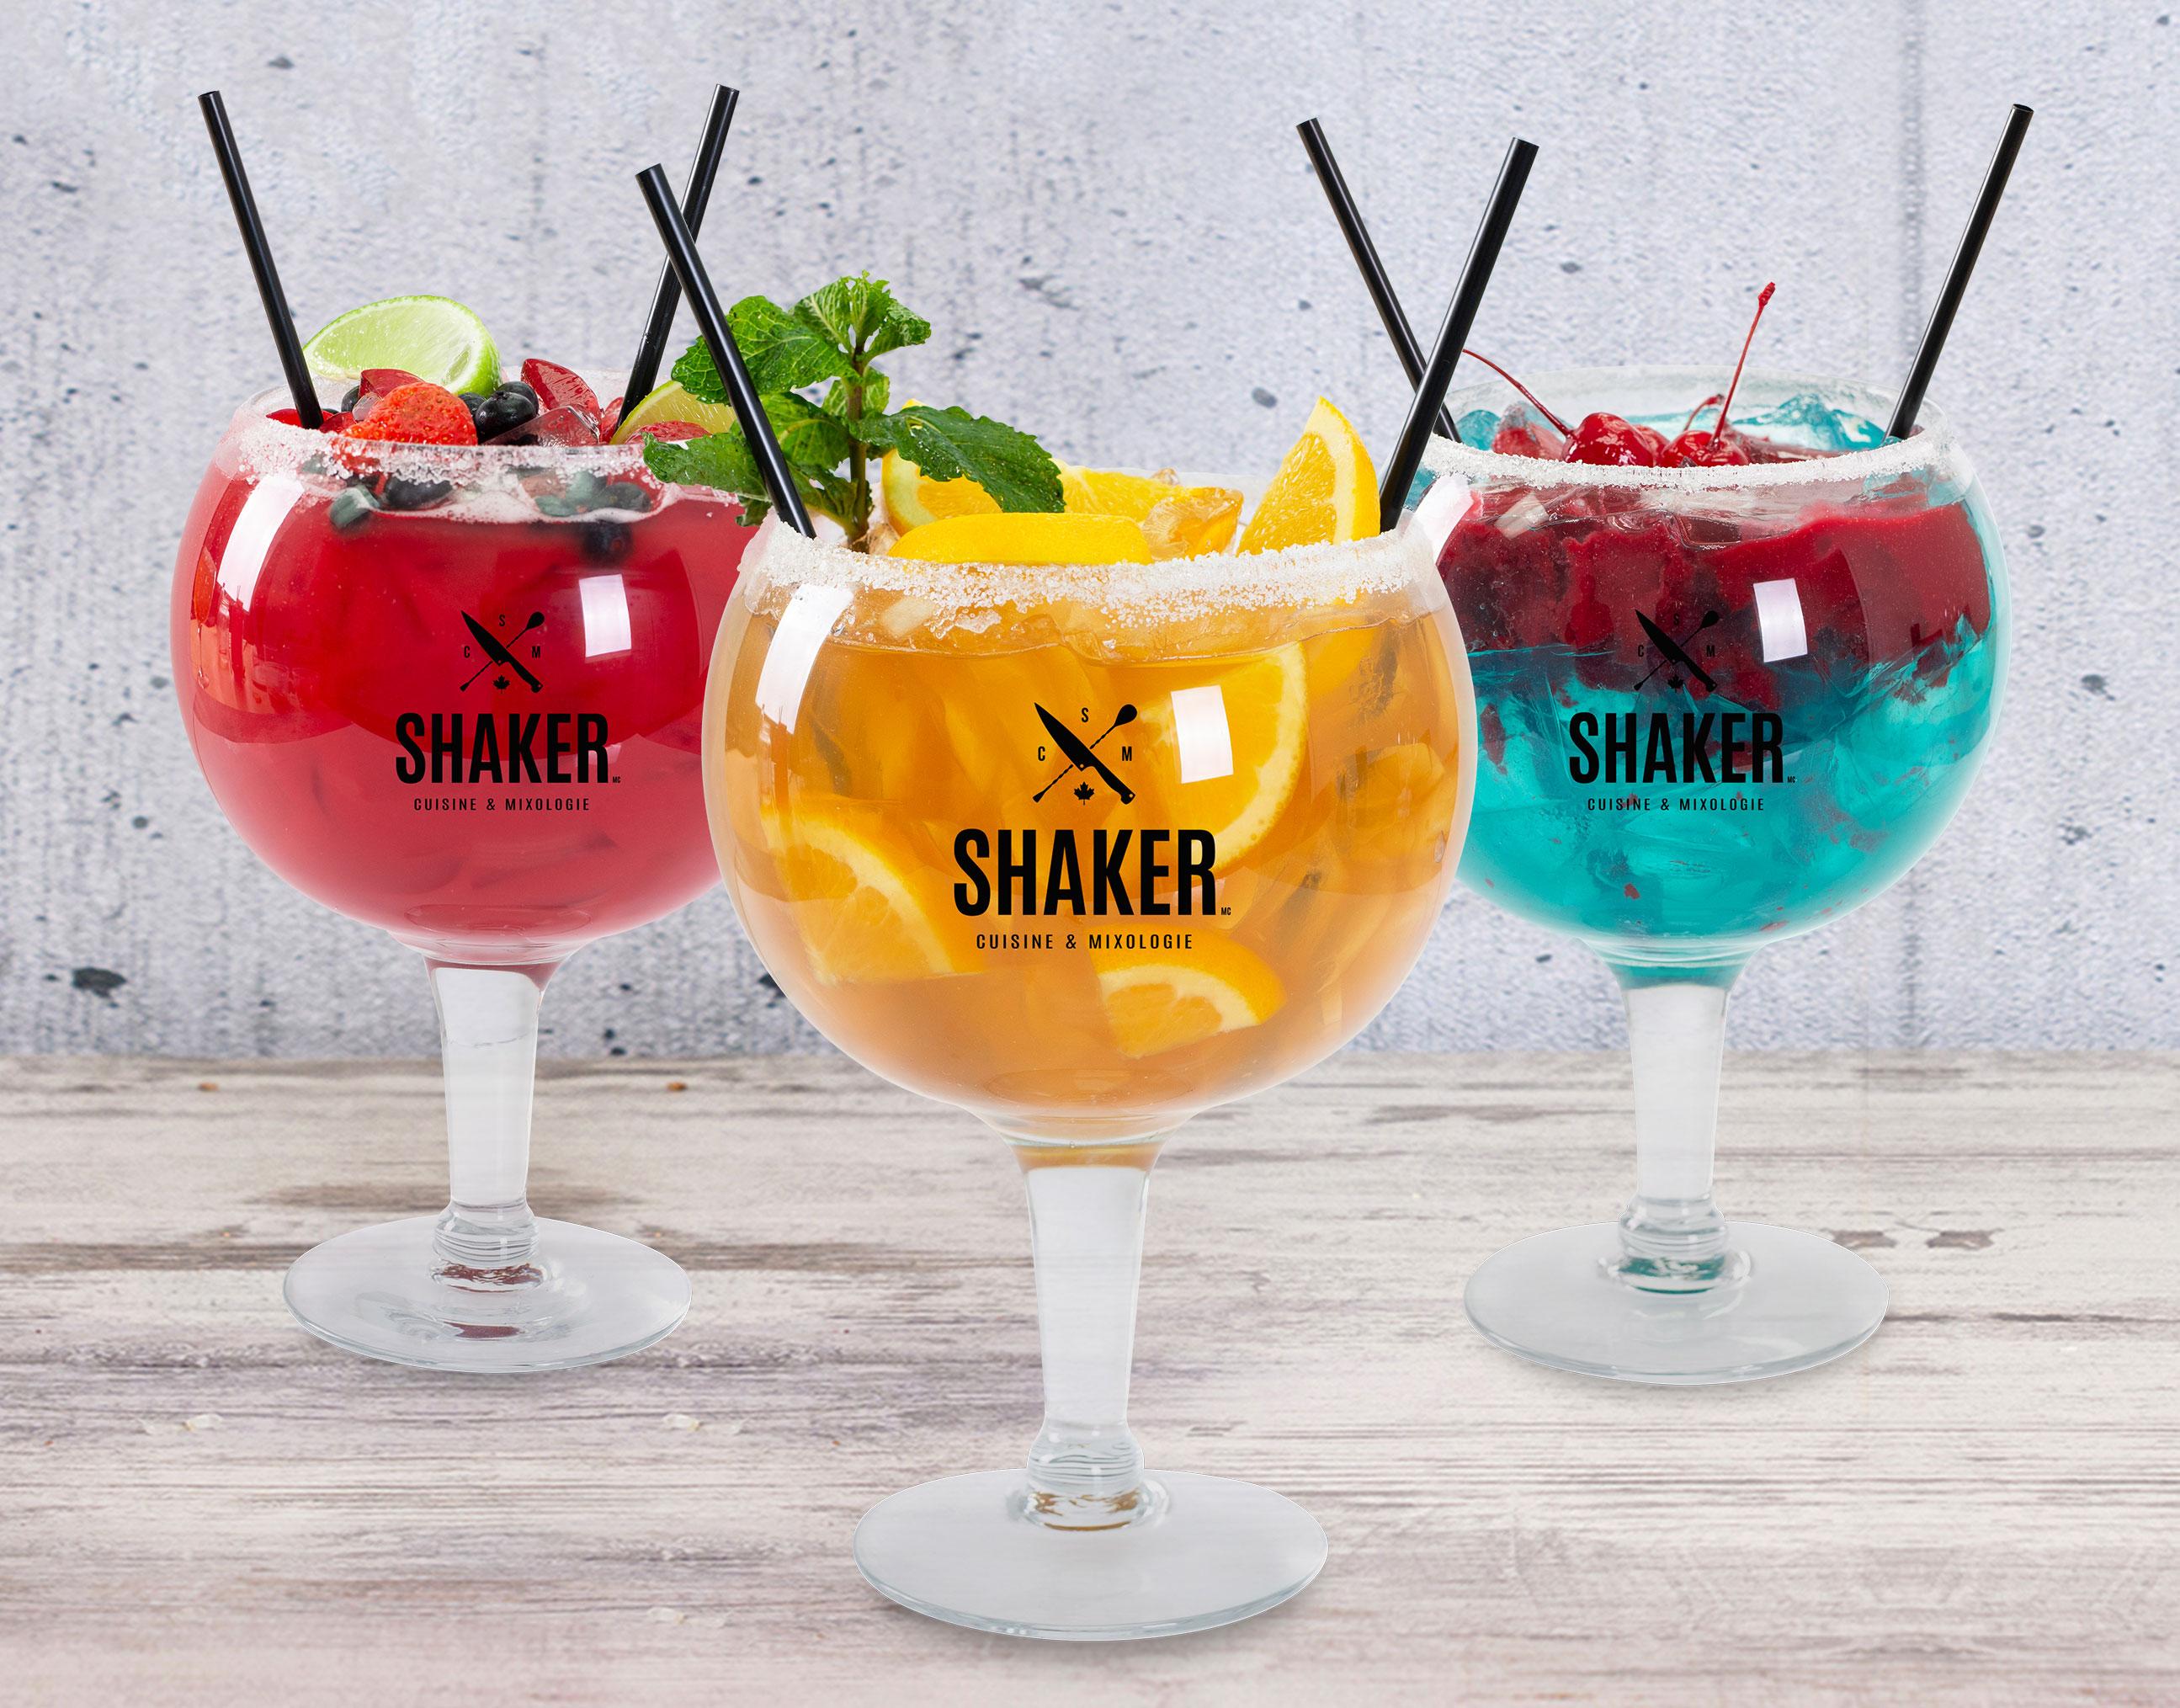 https://www.shakercuisineetmixologie.com/files/2019/06/Cocktails_FausseFamille_3-Graal.jpg